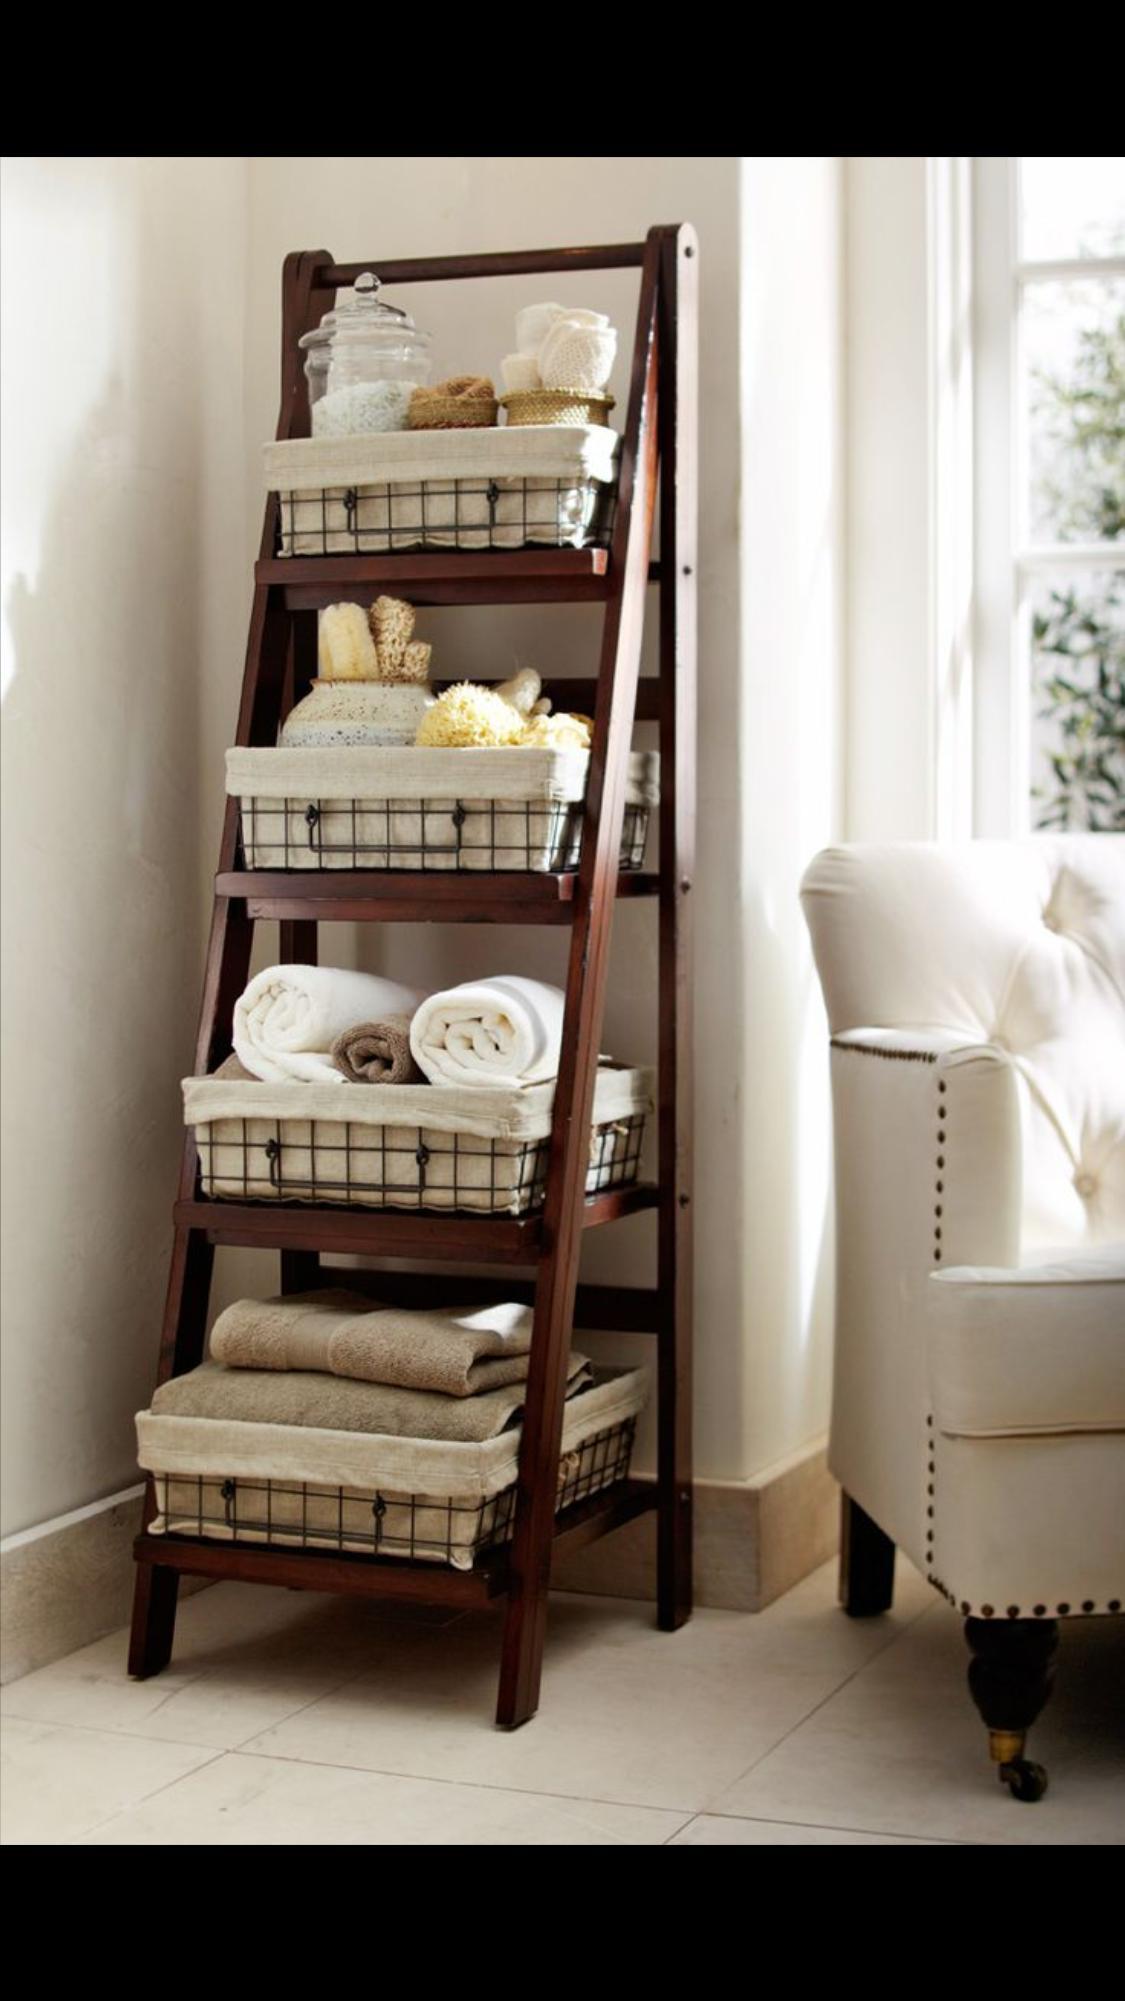 Pin by fernanda zamora on home decor furniture pinterest